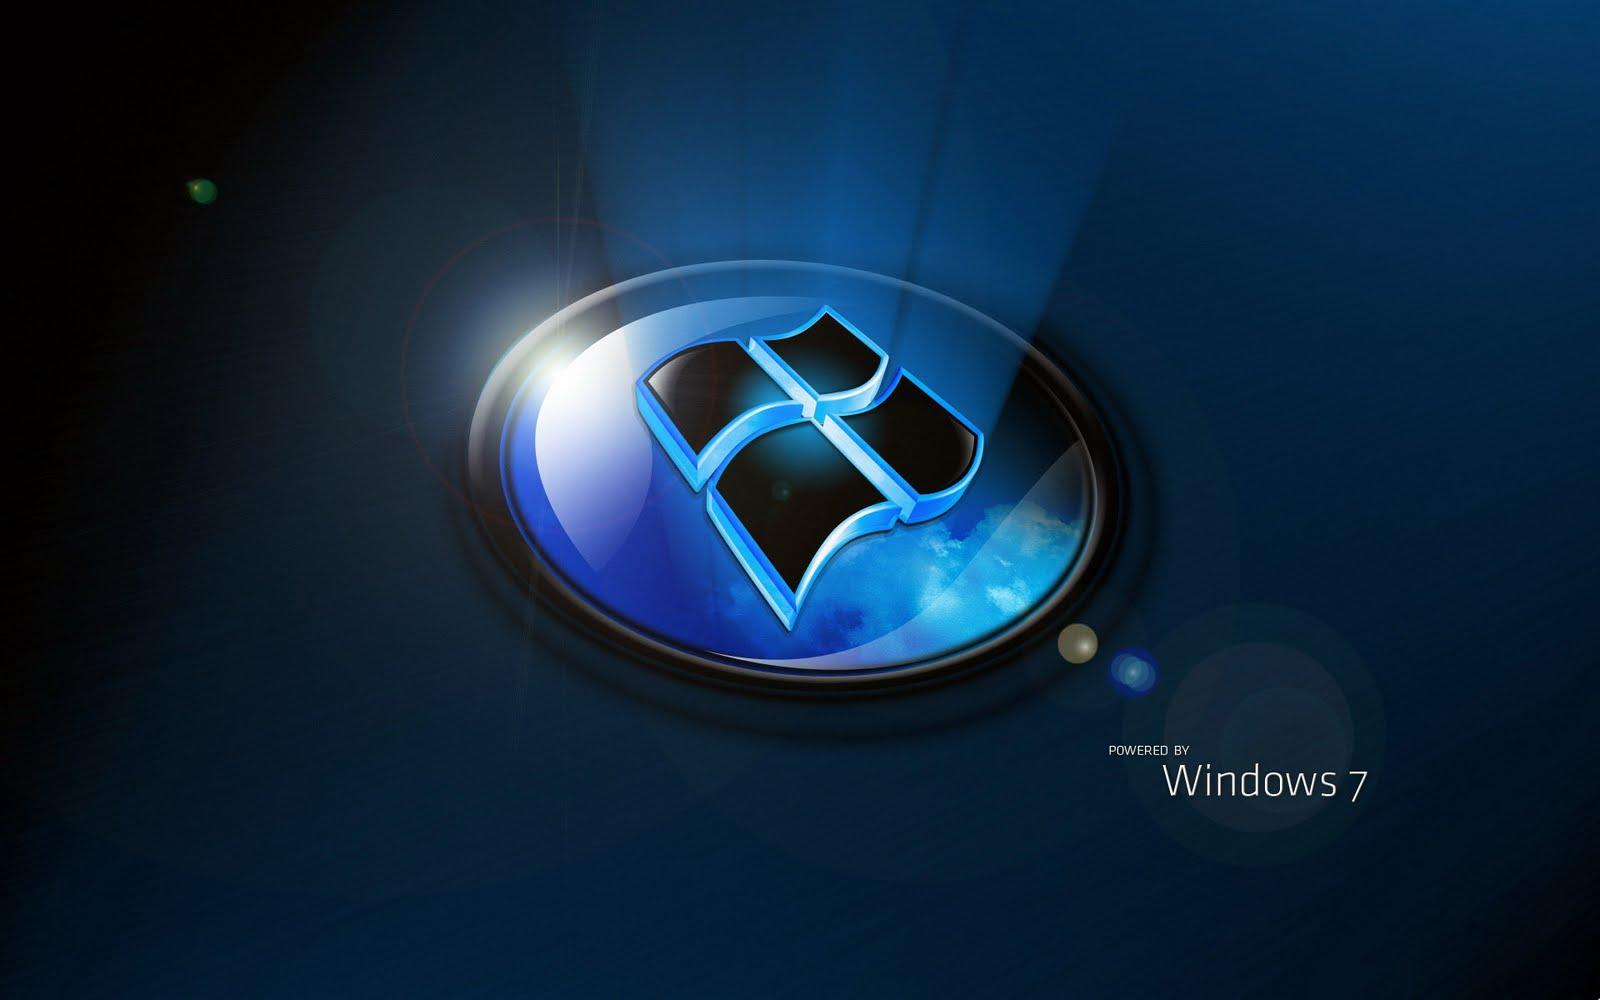 http://4.bp.blogspot.com/-YE_i9c-dDyU/TnacevL9vtI/AAAAAAAAA2M/HEngK8vXZVQ/s1600/cool-windows-7-free-wallpaper_1920x1200_71426.jpg